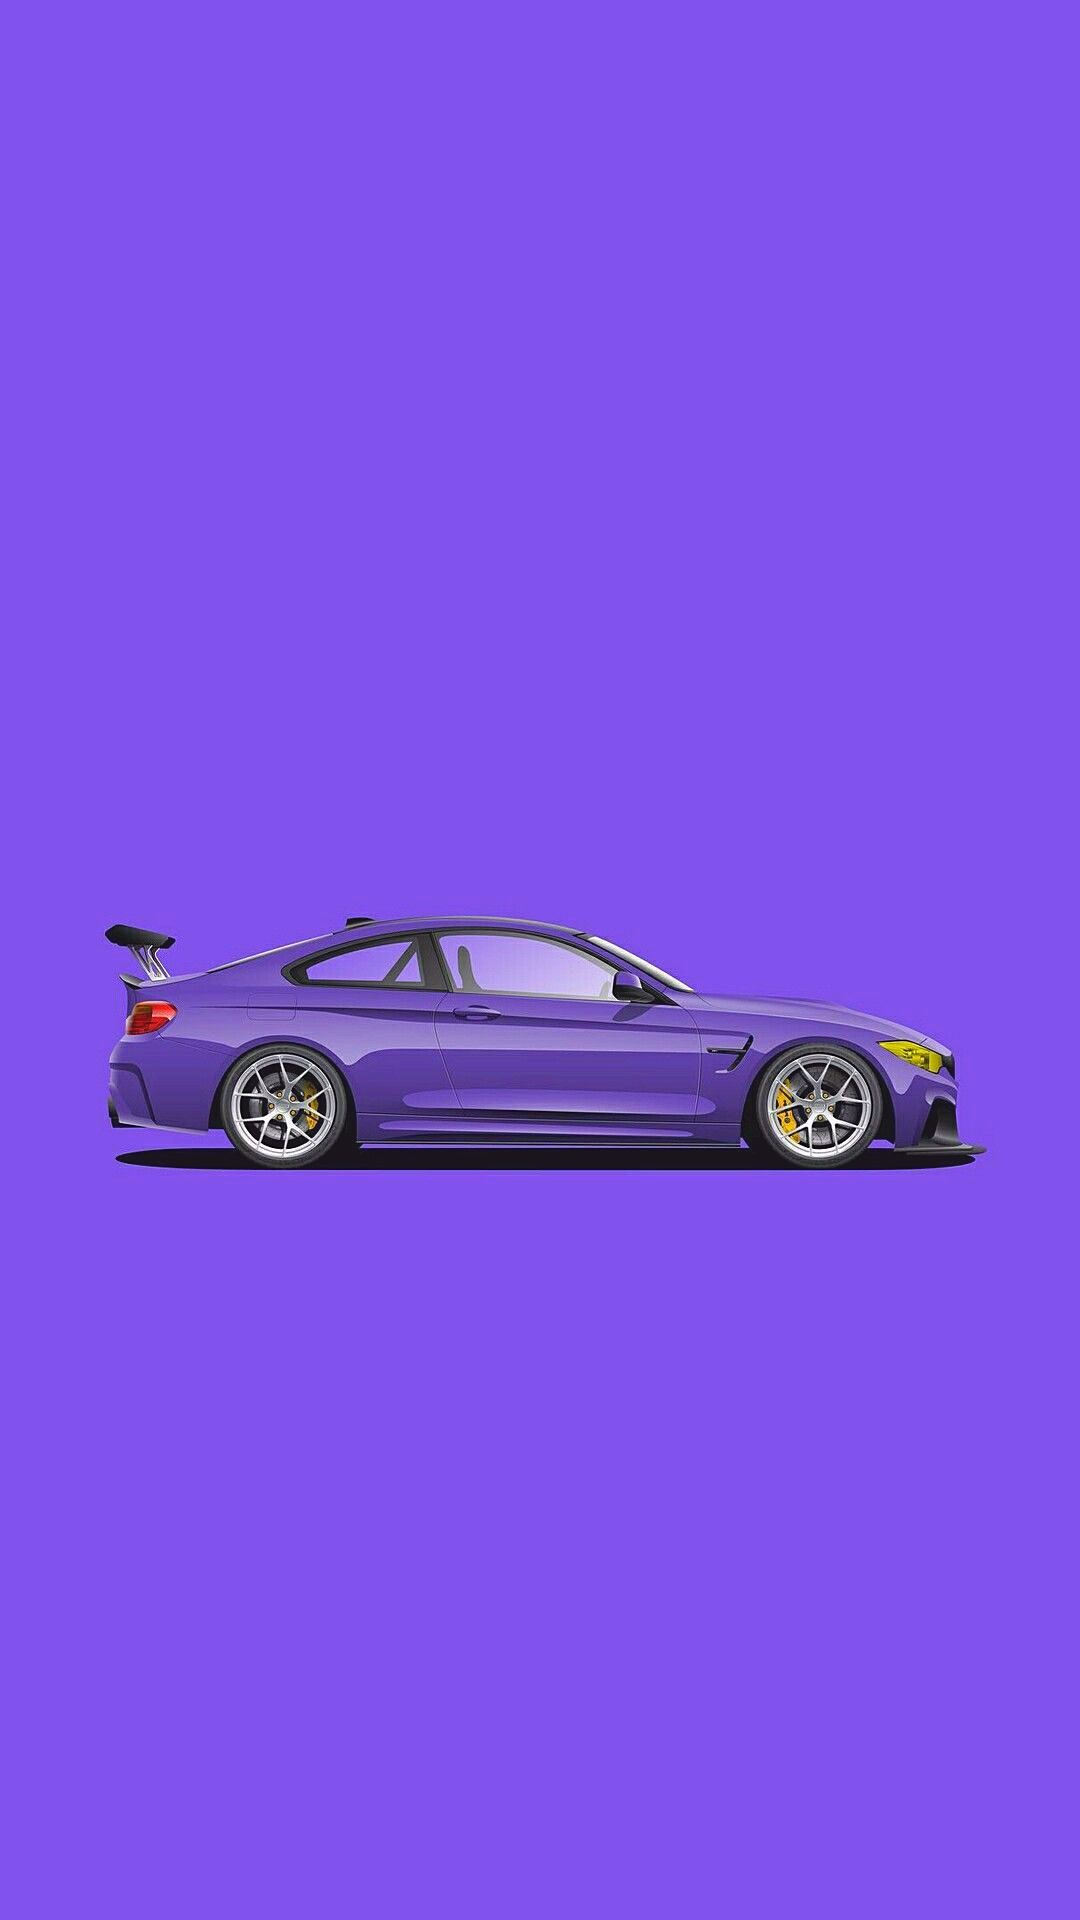 Supercar Minimal Wallpaper 1080x1920 In 2020 Car Iphone Wallpaper Bmw Art Car Wallpapers